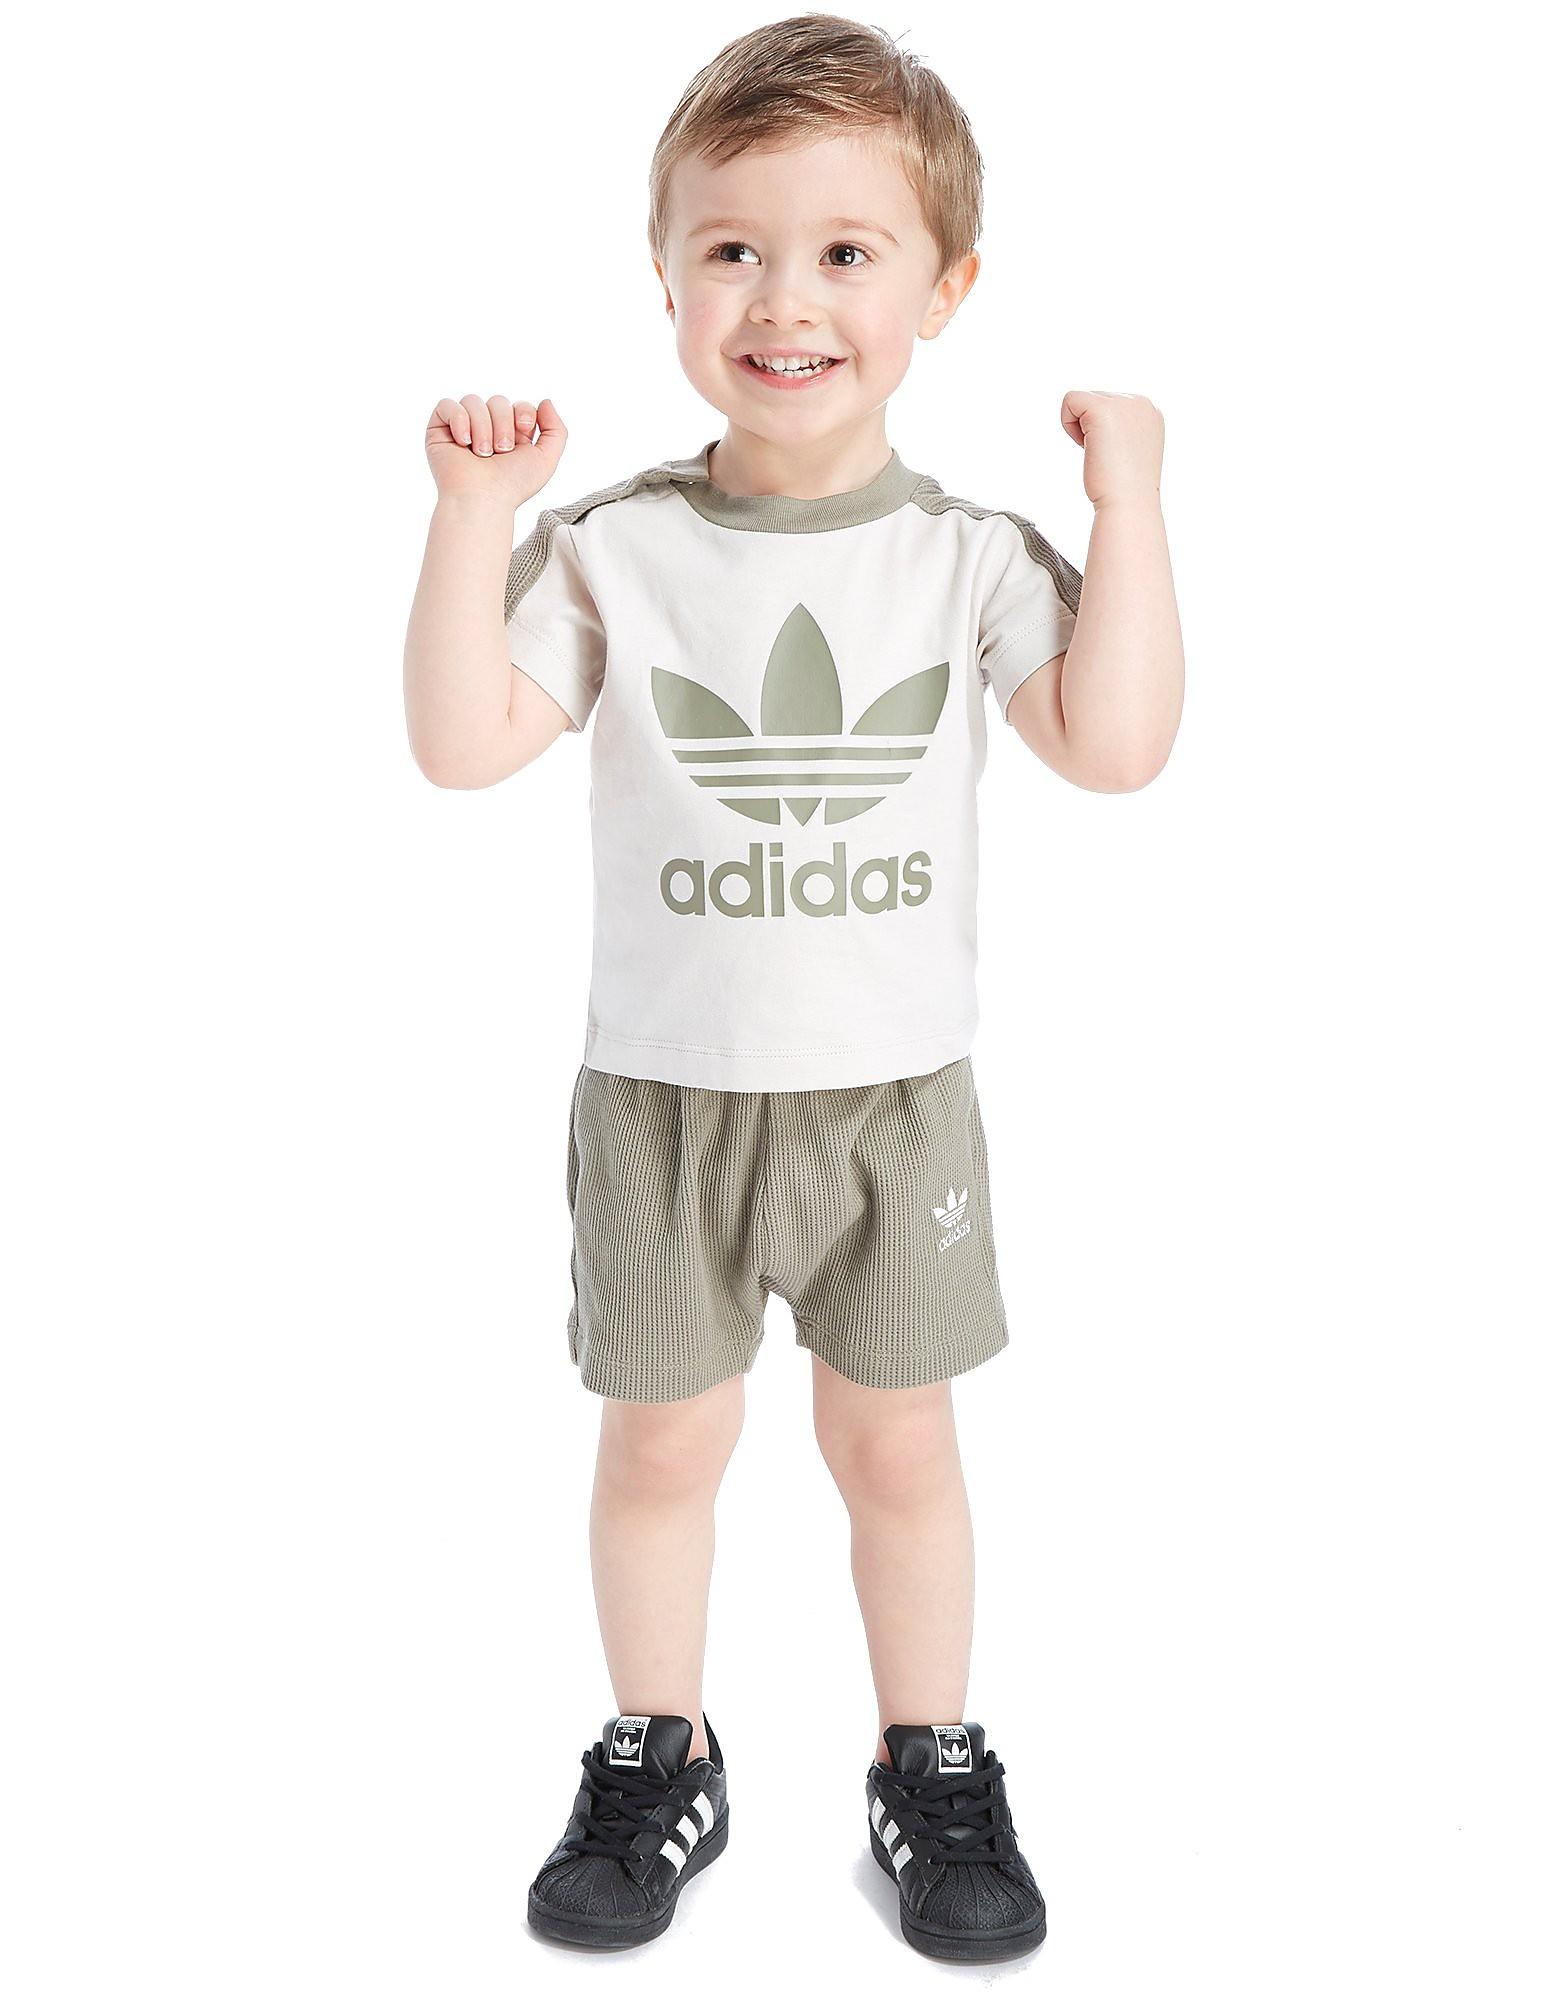 adidas Originals adidias Originals MOA Short Set Infant